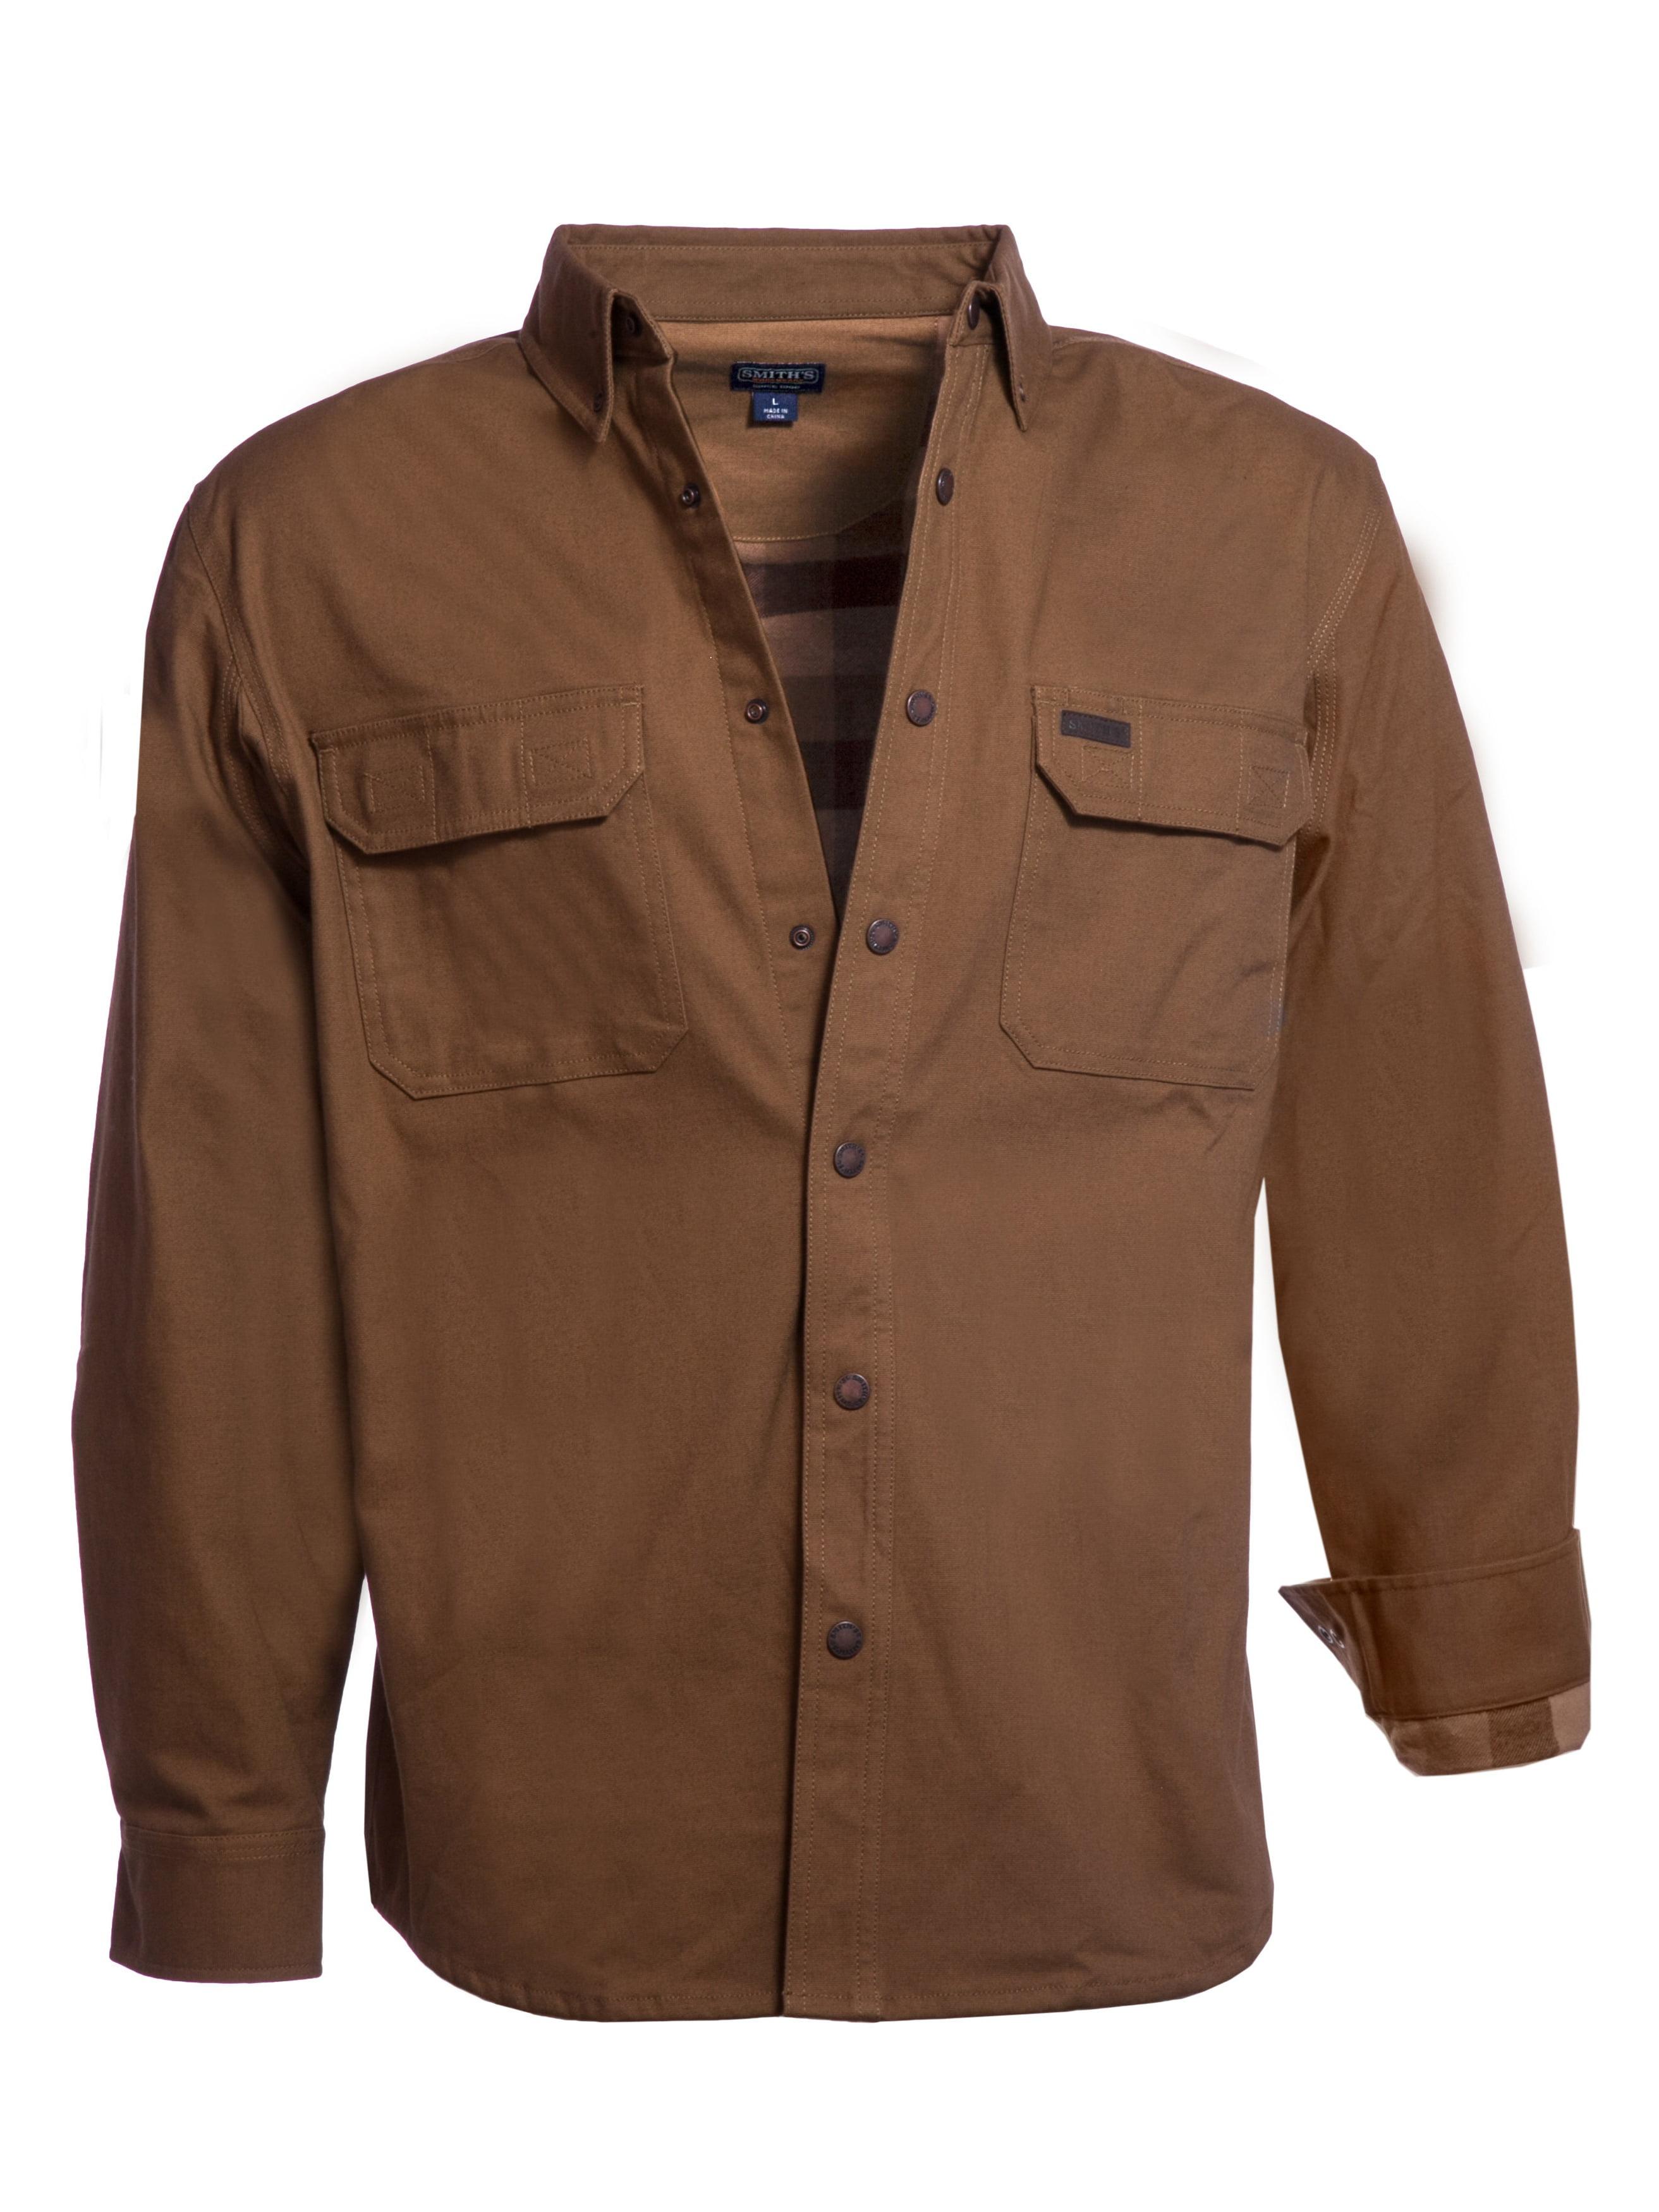 Smiths Workwear Mens Fleece Lined Canvas Shirt Jacket